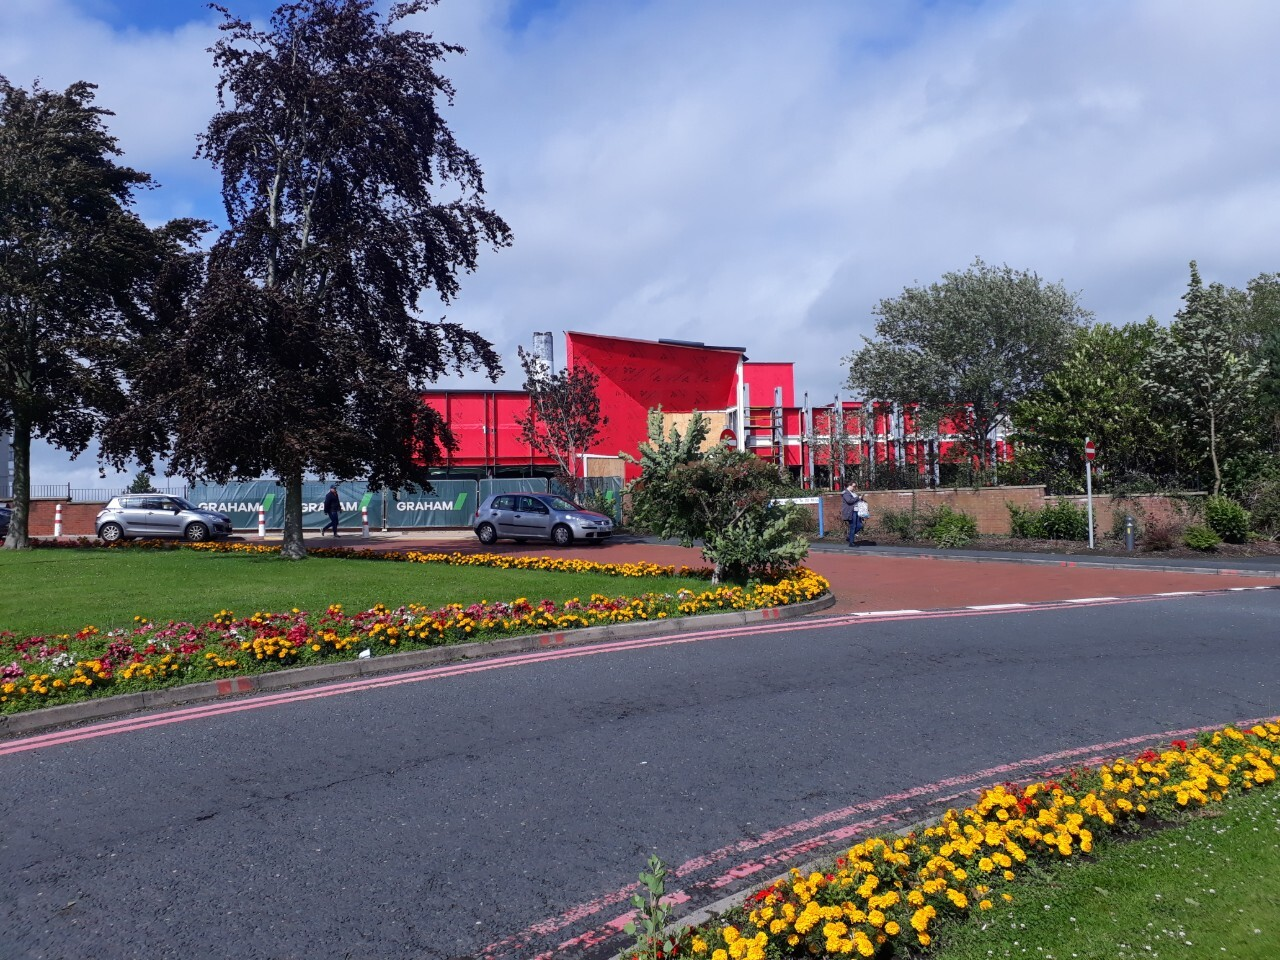 Multi-million pound cancer centre remains on track despite COVID-19 image